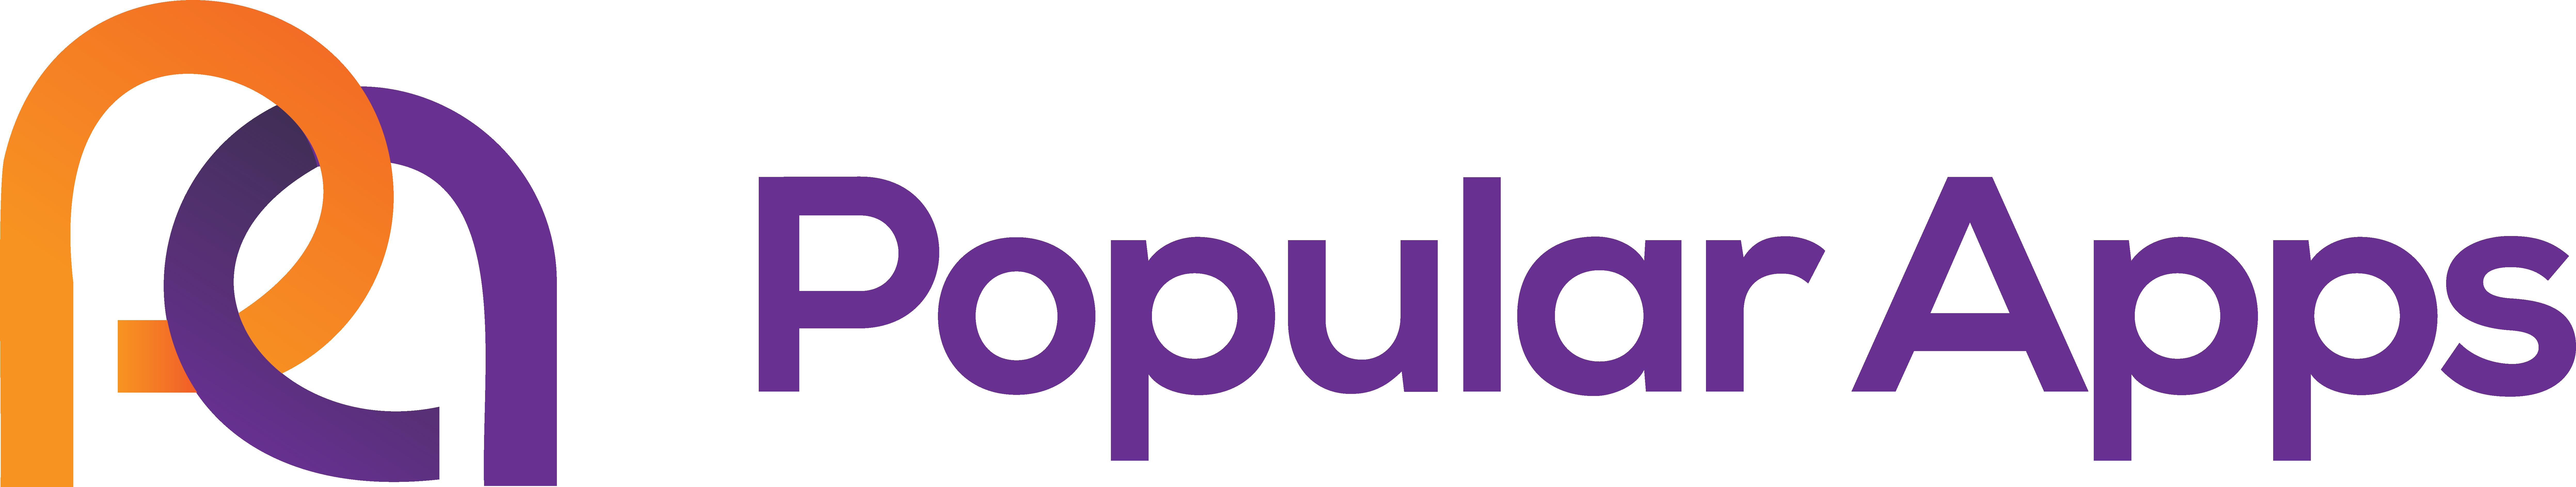 Popularapps